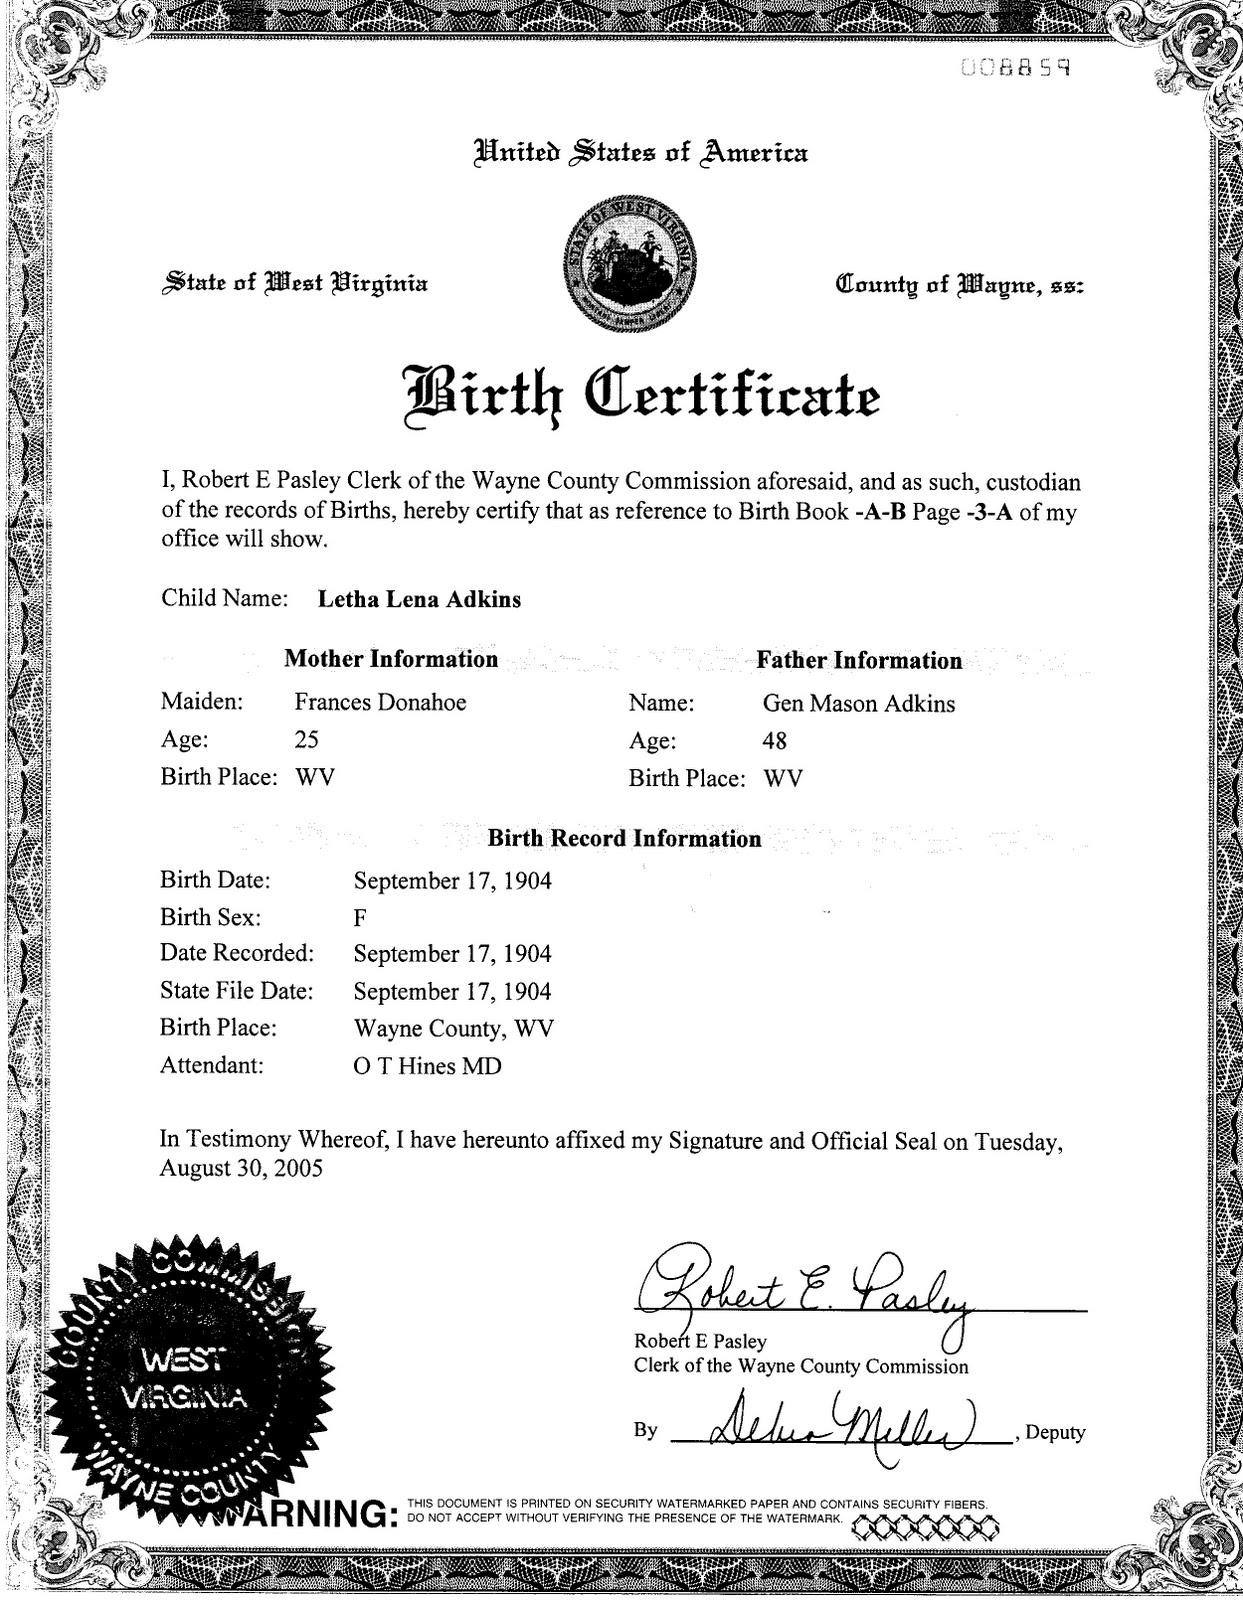 West Virginia Birth Certificate Death Vital Records Oukasfo